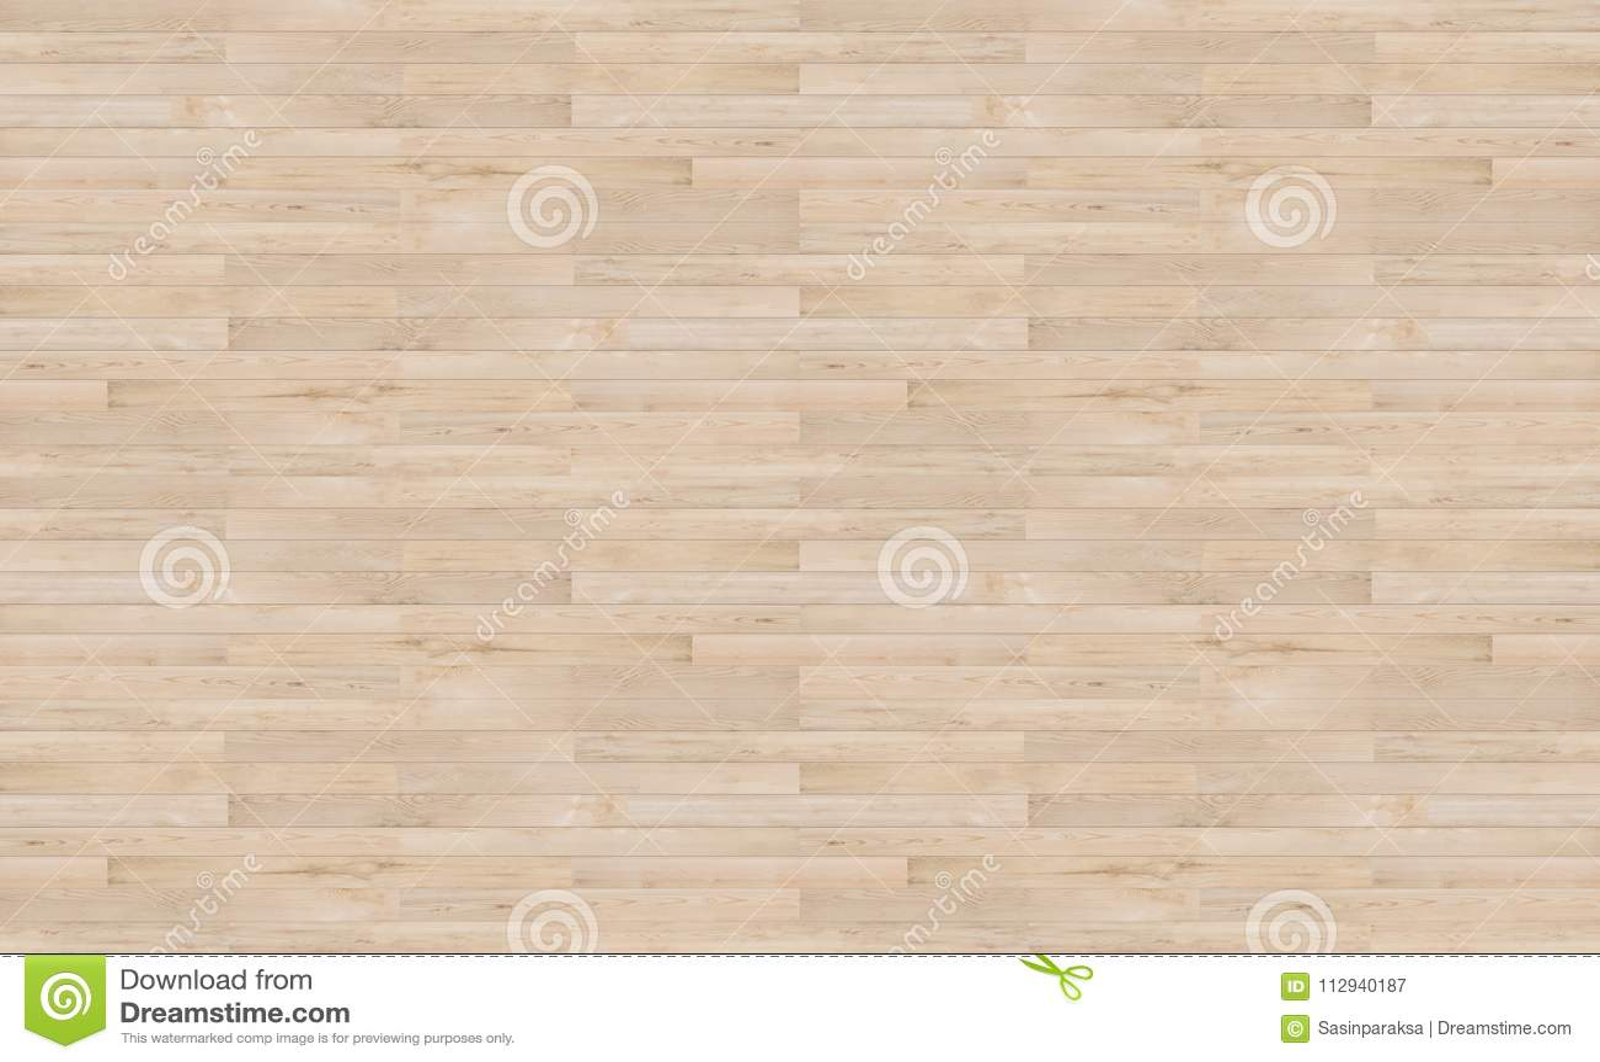 Fondo de madera de la textura, piso inconsútil de madera de roble